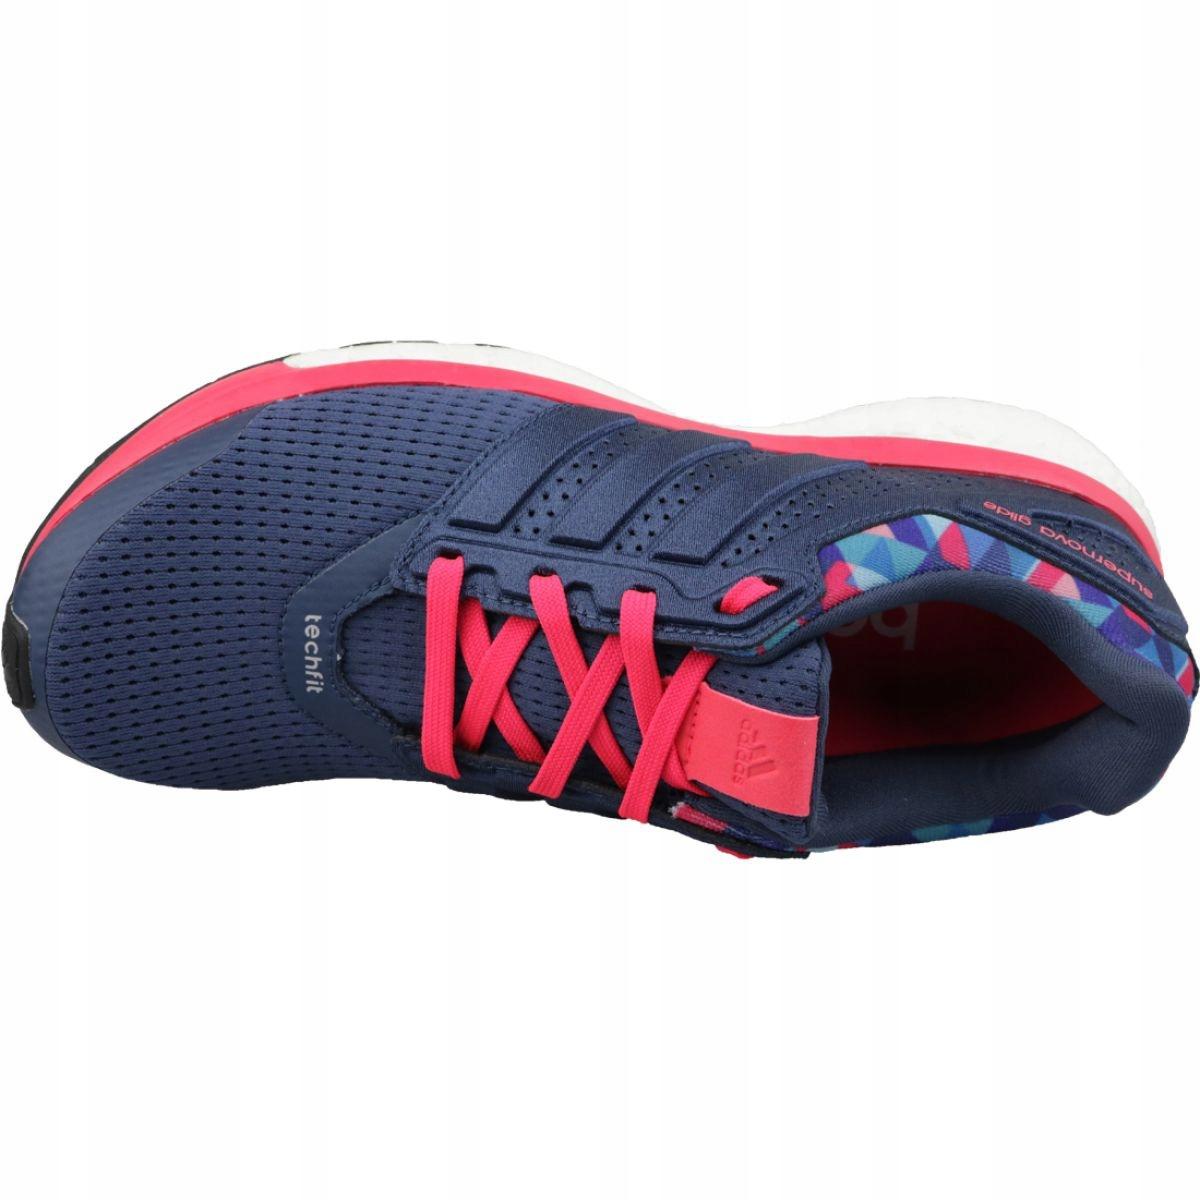 Détails sur Chaussures adidas Supernova Glide 8 Gfx W AQ5059 marine